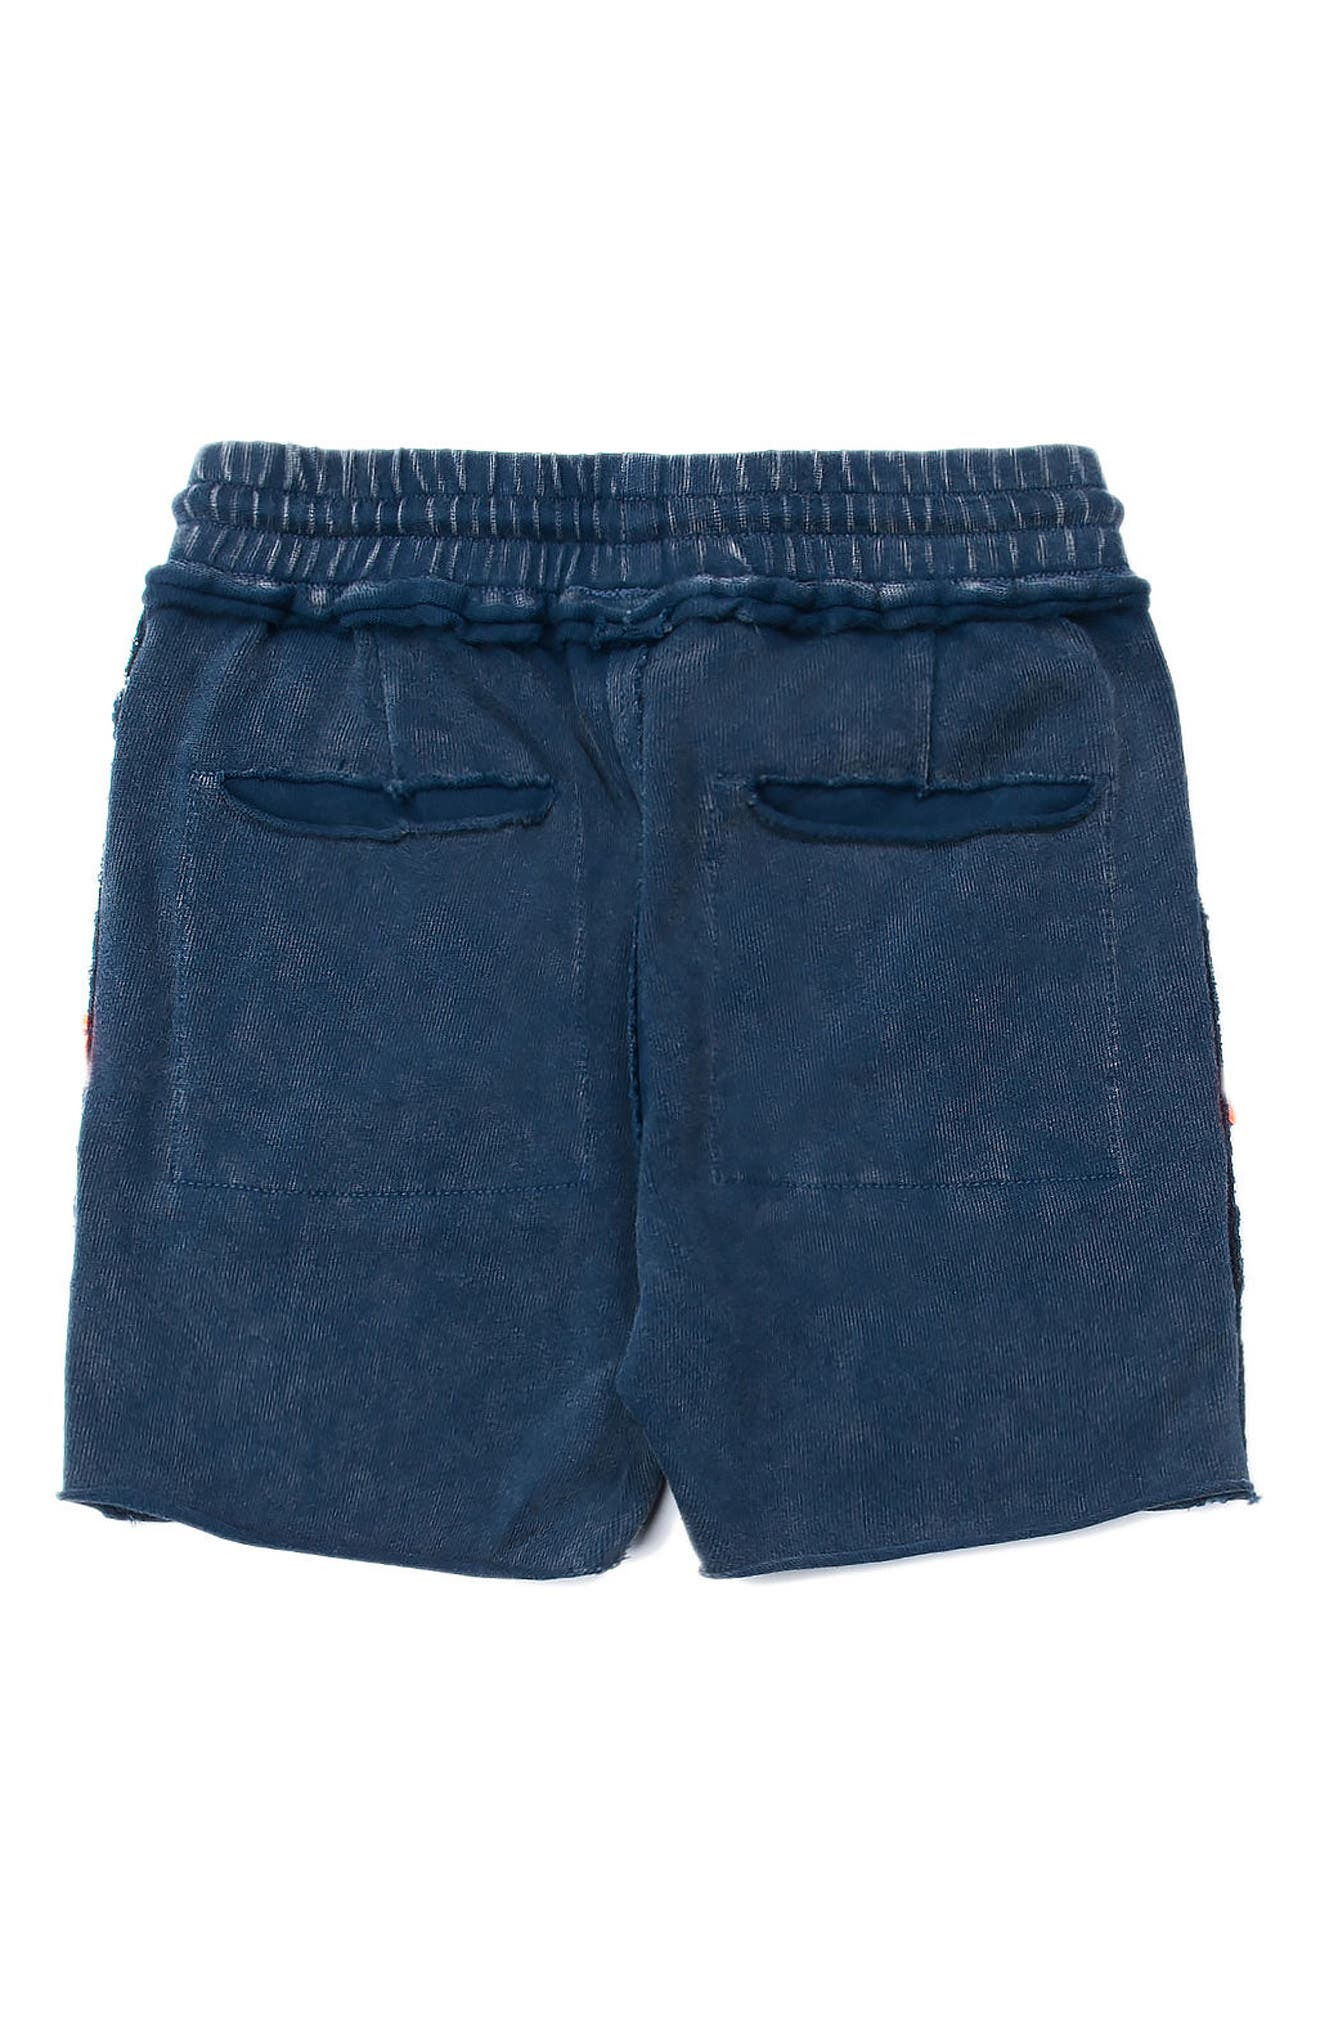 Kirk Knit Shorts,                             Alternate thumbnail 2, color,                             NAVY